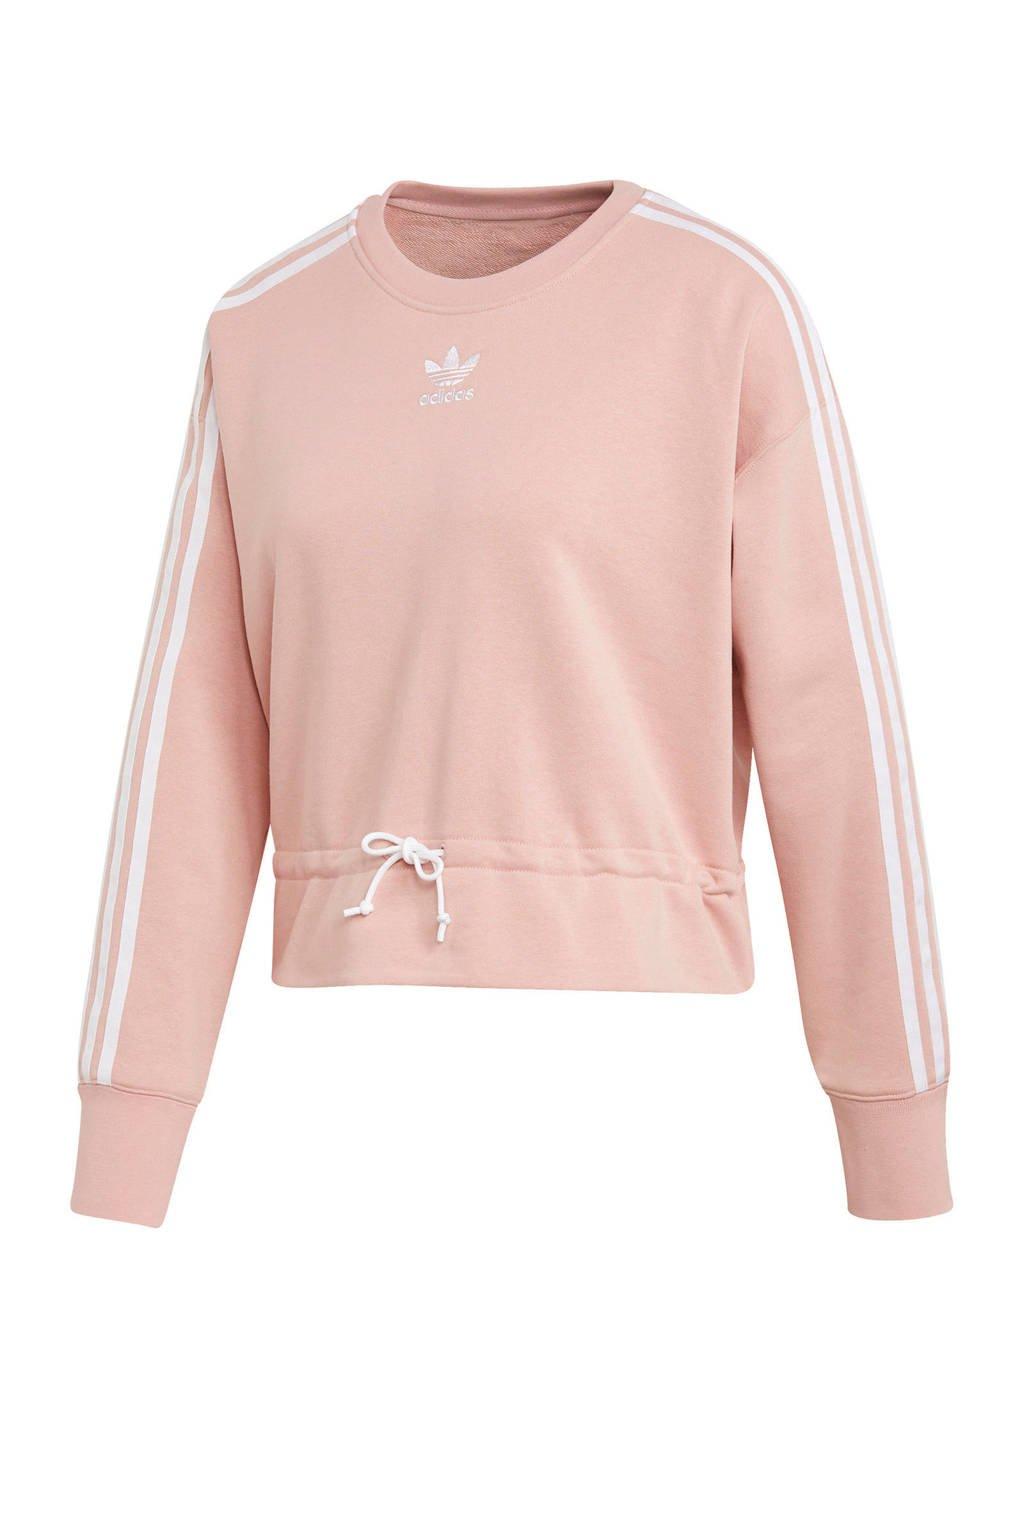 adidas Originals cropped sweater roze, Roze/wit